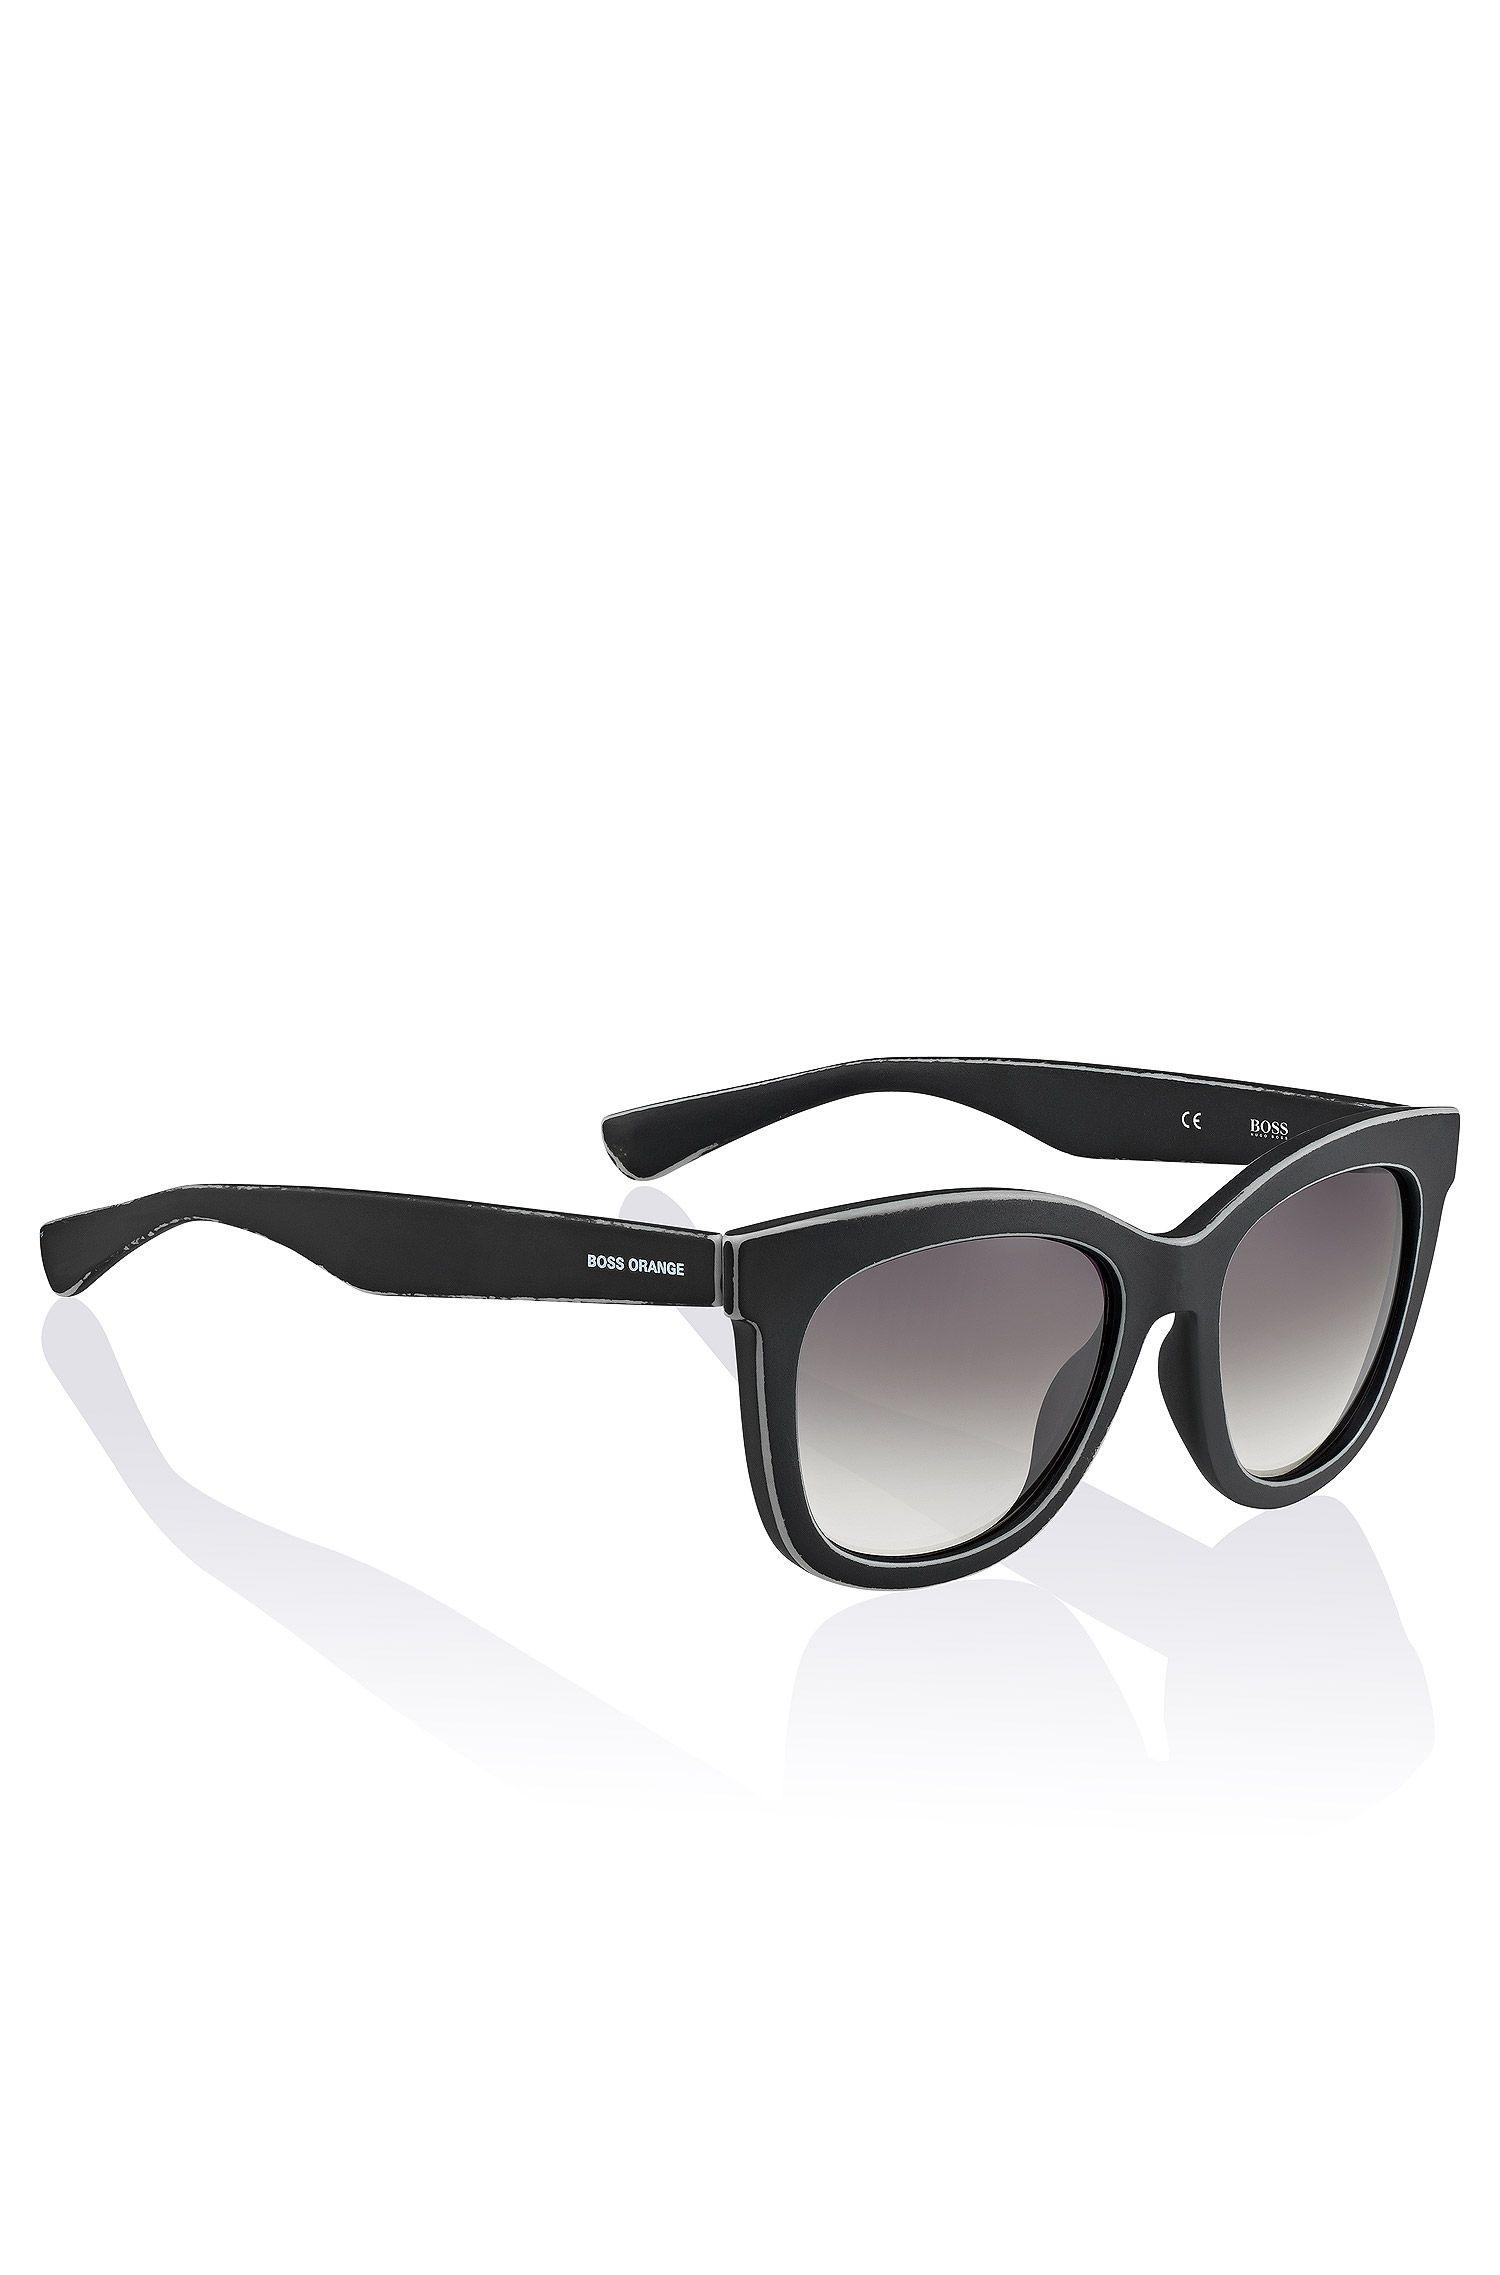 Wayfarer-Sonnenbrille ´BO 0199` aus Acetat